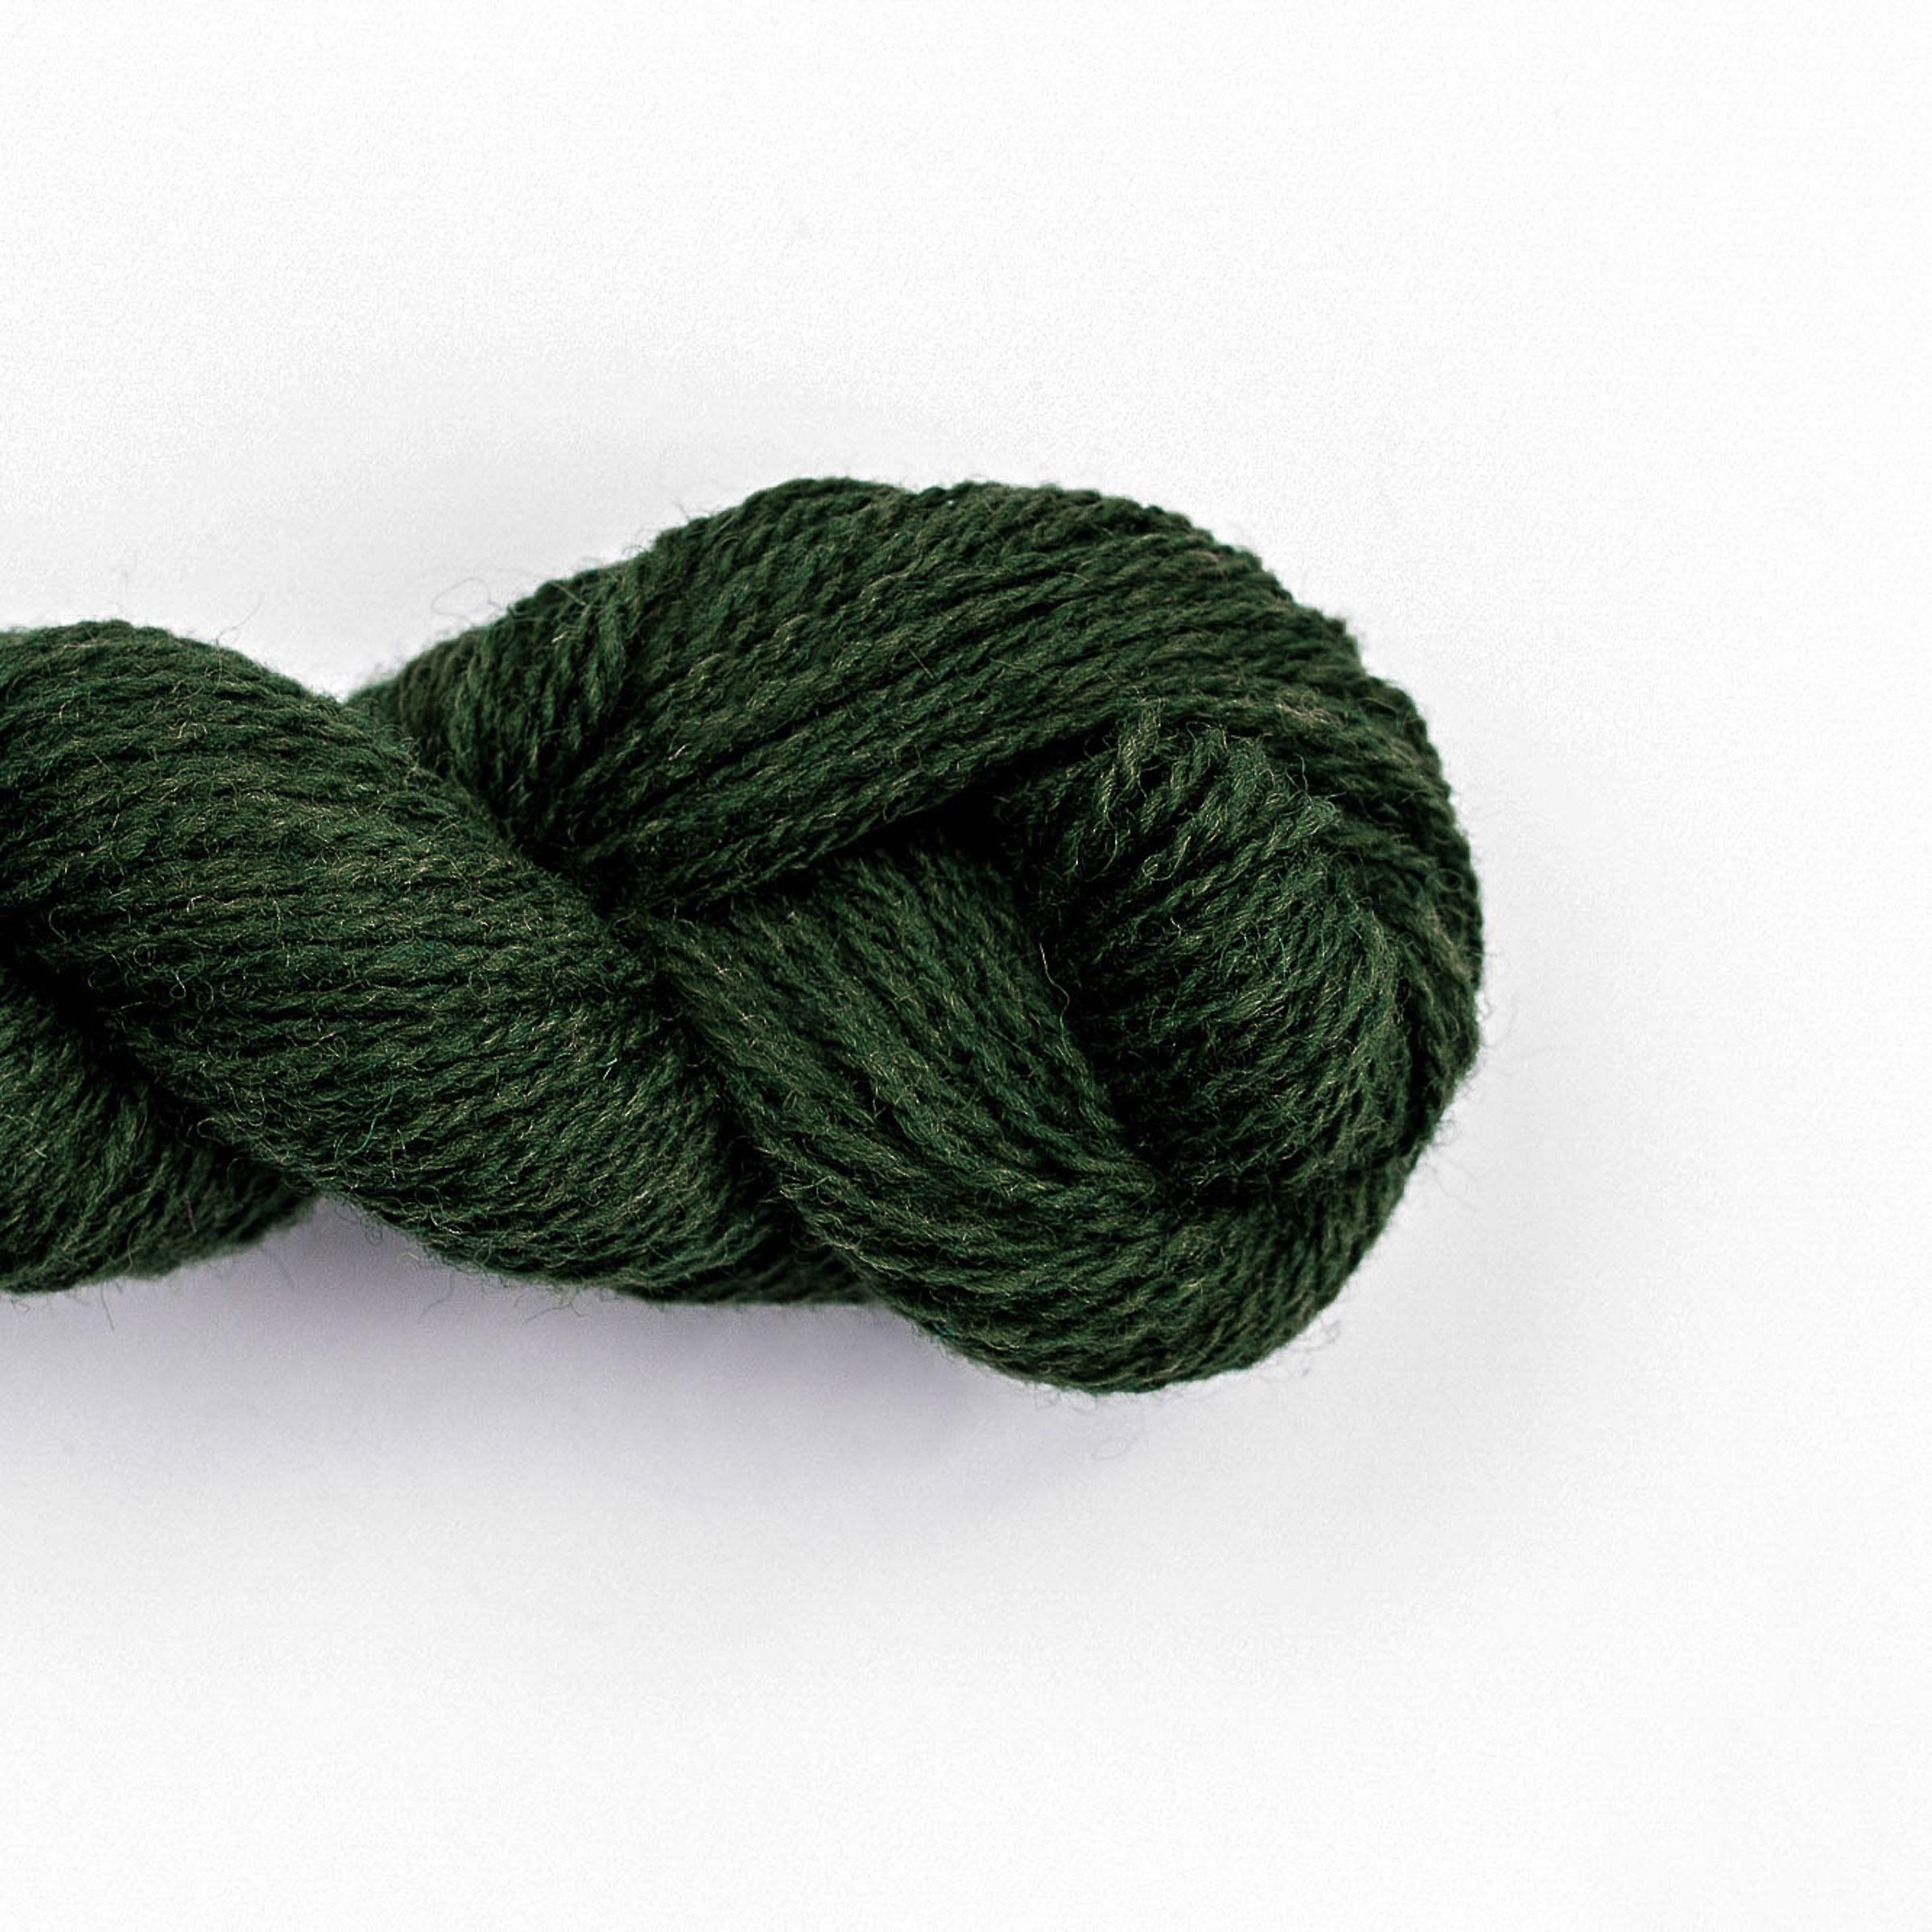 Wool yarn,100% natural, knitting - crochet - craft supplies